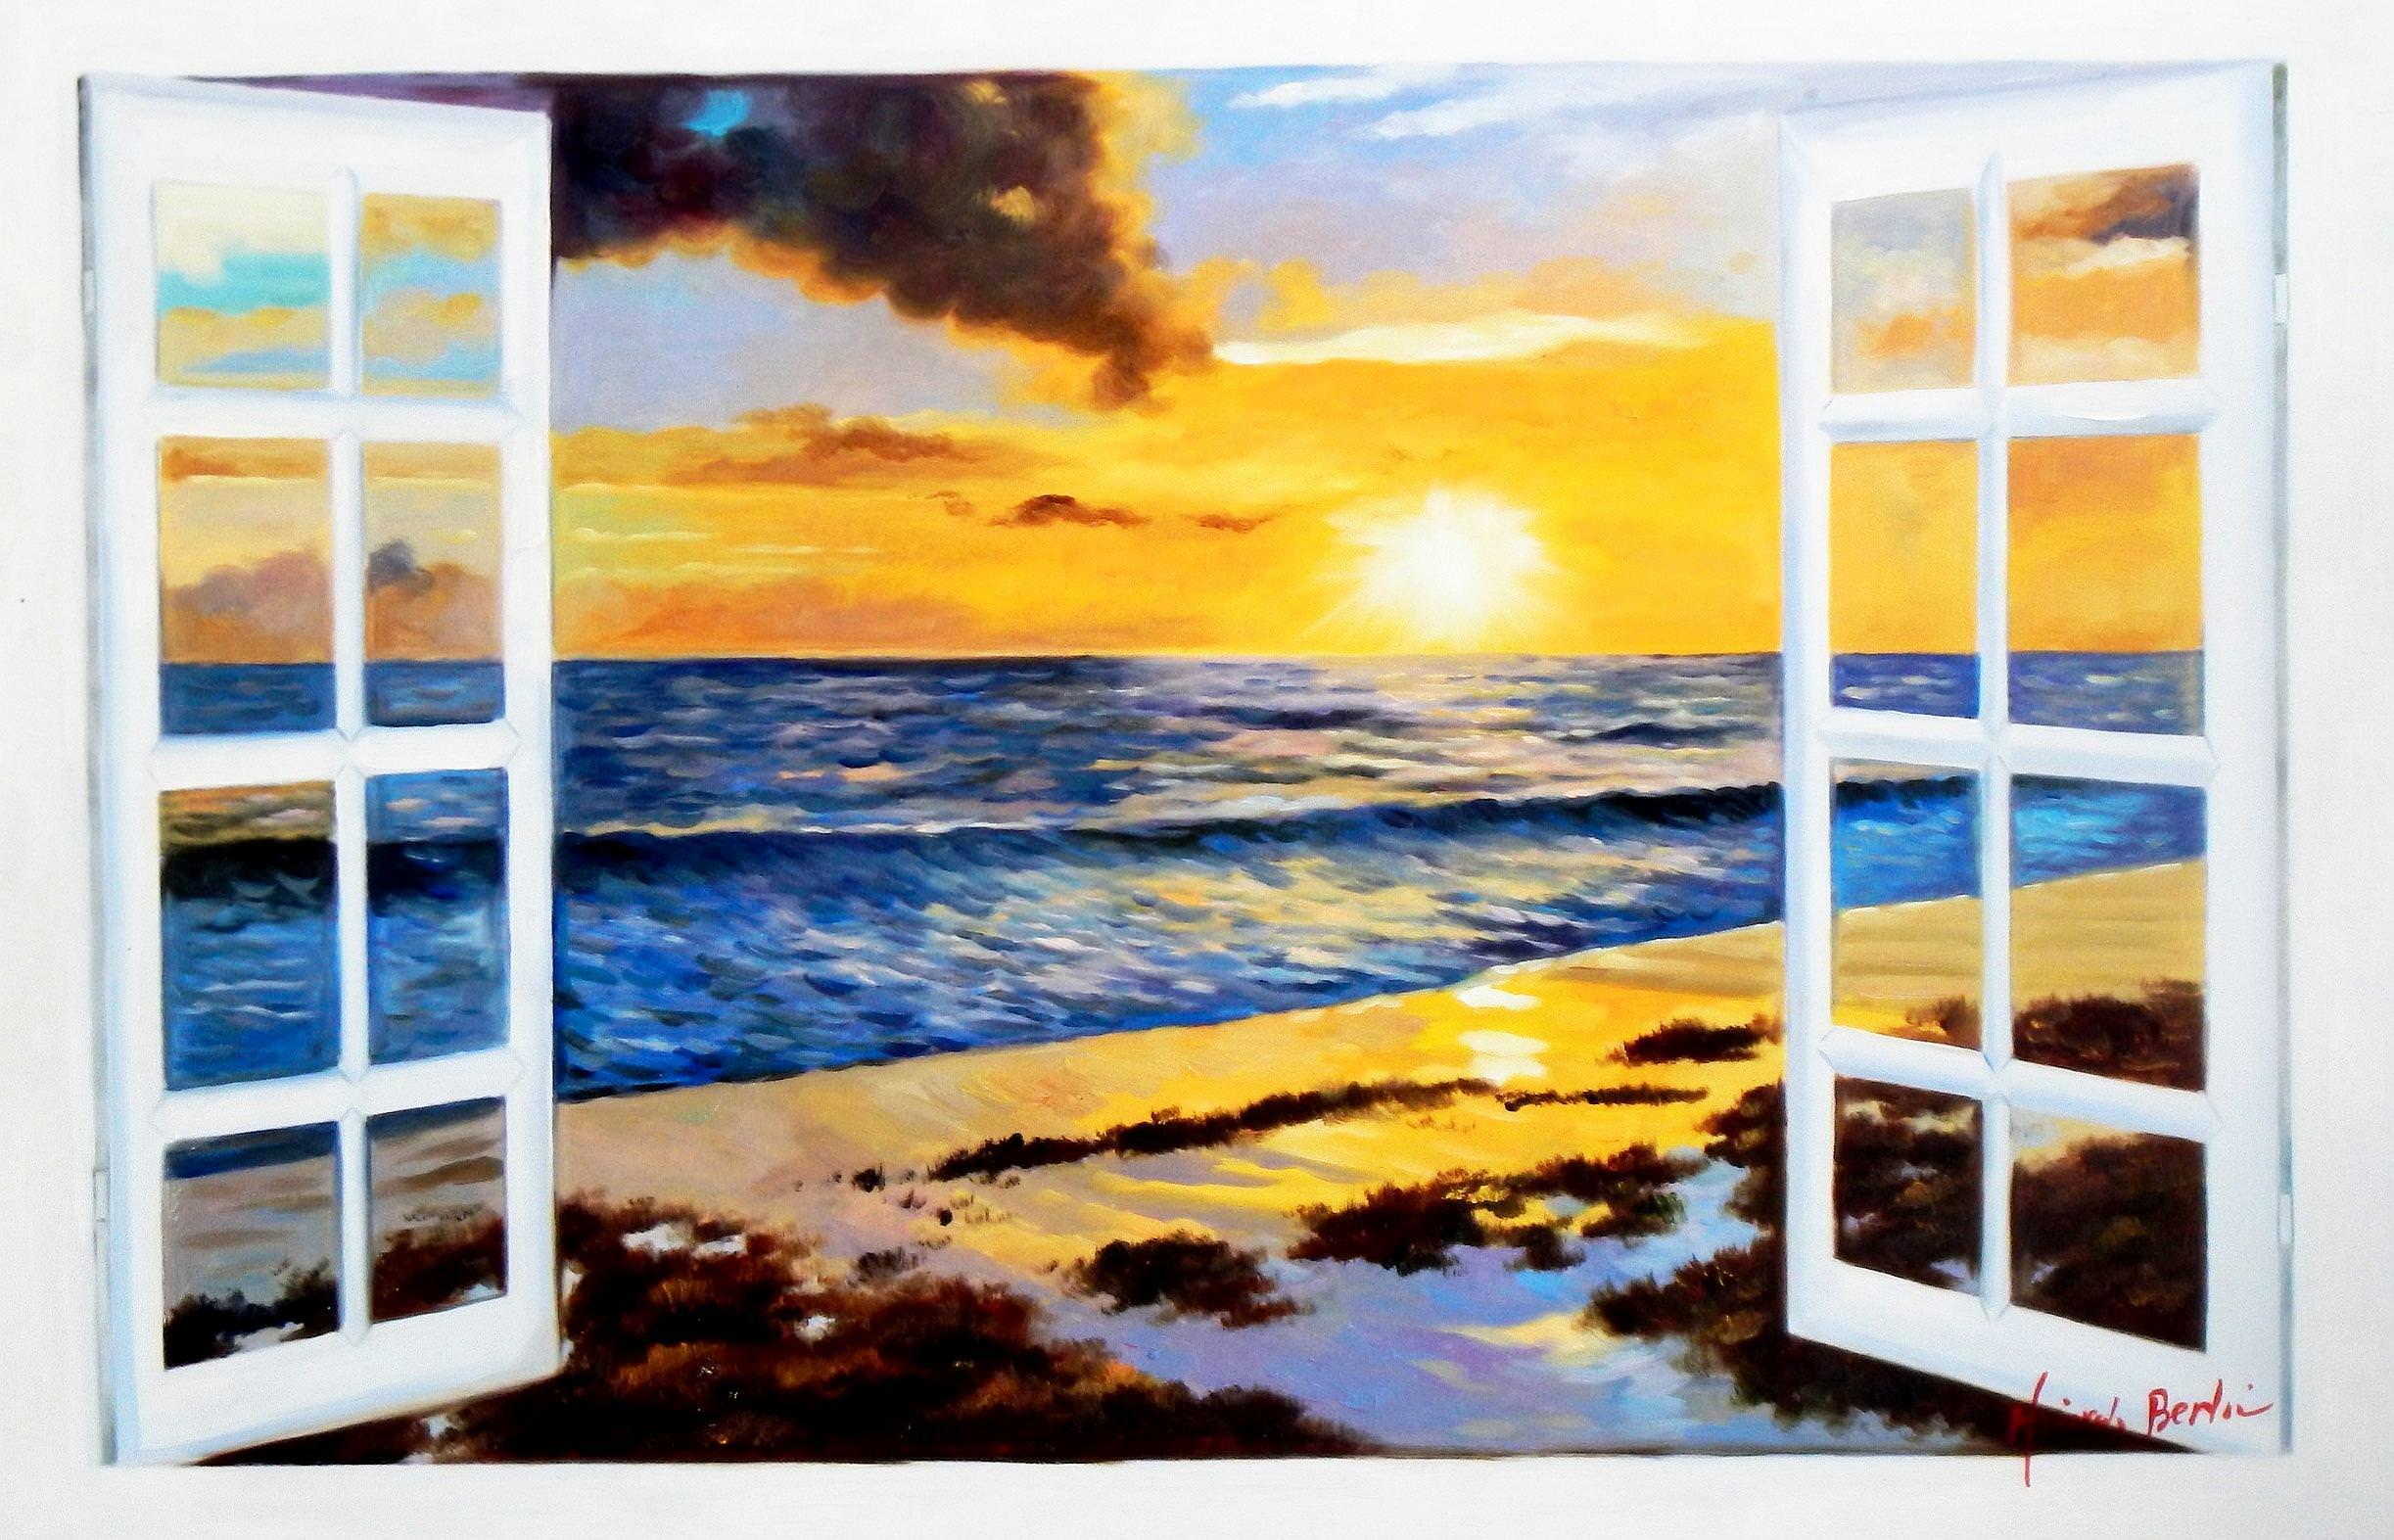 Modern Art - Sonnenuntergang auf Sylt d93942 60x90cm Ölbild handgemalt